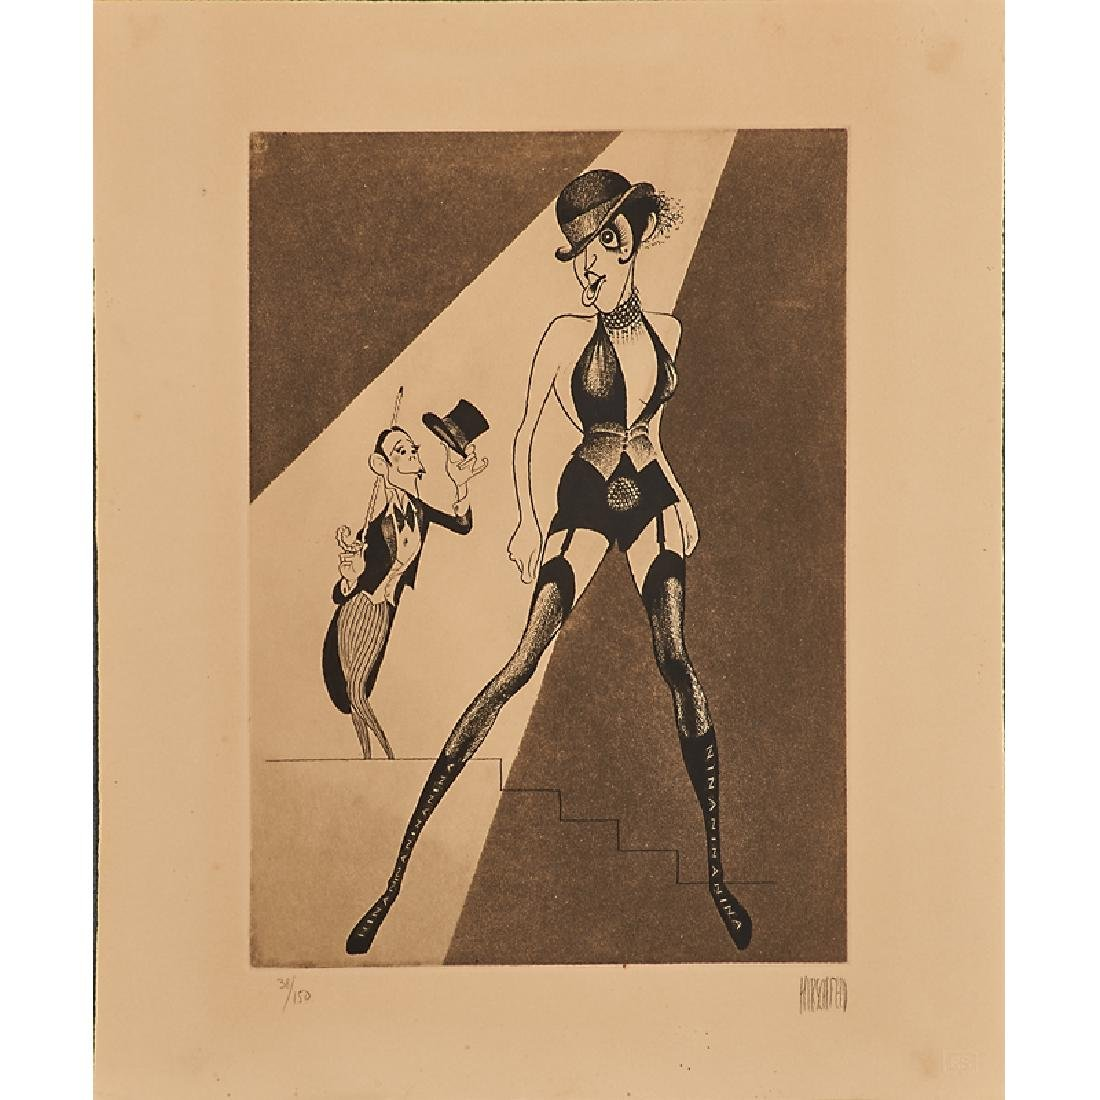 AL HIRSCHFELD (American, 1903-2003) - 4